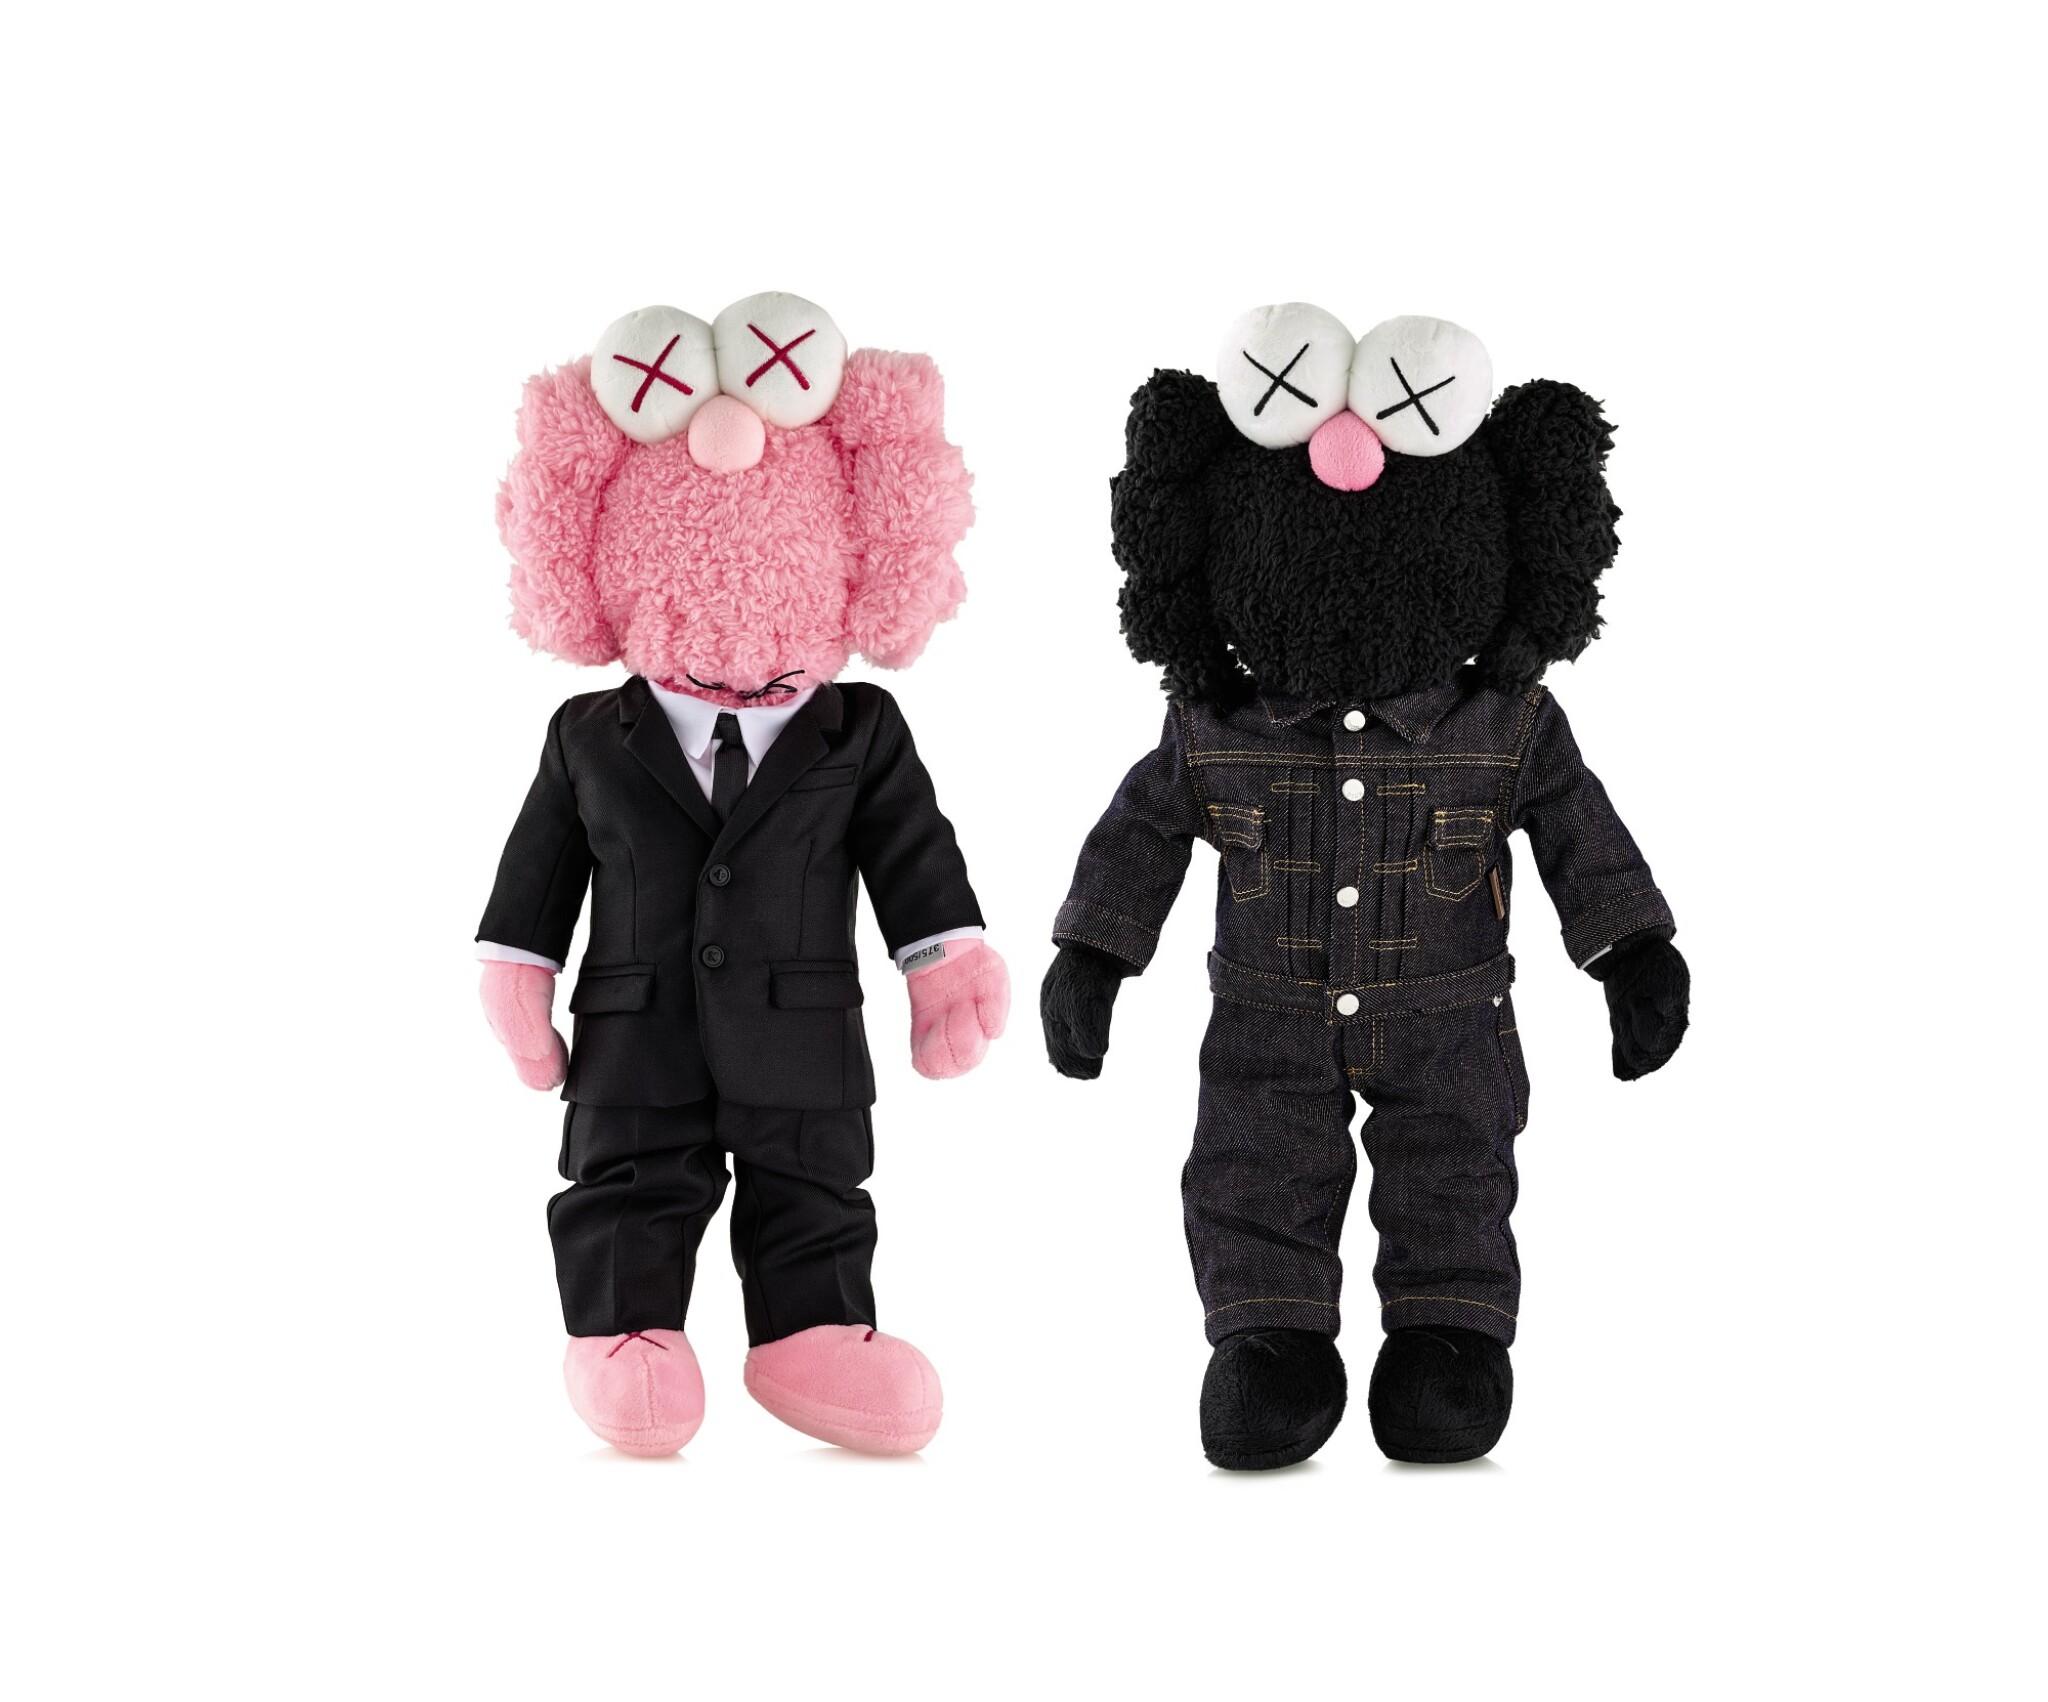 View full screen - View 1 of Lot 9020. KAWS | DIOR X KAWS BFF粉紅色與黑色絨毛玩具(兩件)DIOR X KAWS BFF Pink and Black Plush Dolls (two works).